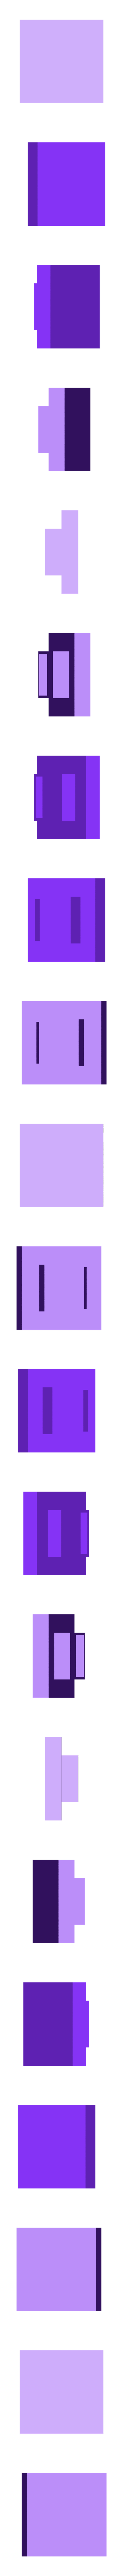 base grande.STL Download free STL file base large size (4 squares, or 10 feet) • 3D printing template, izanferrco